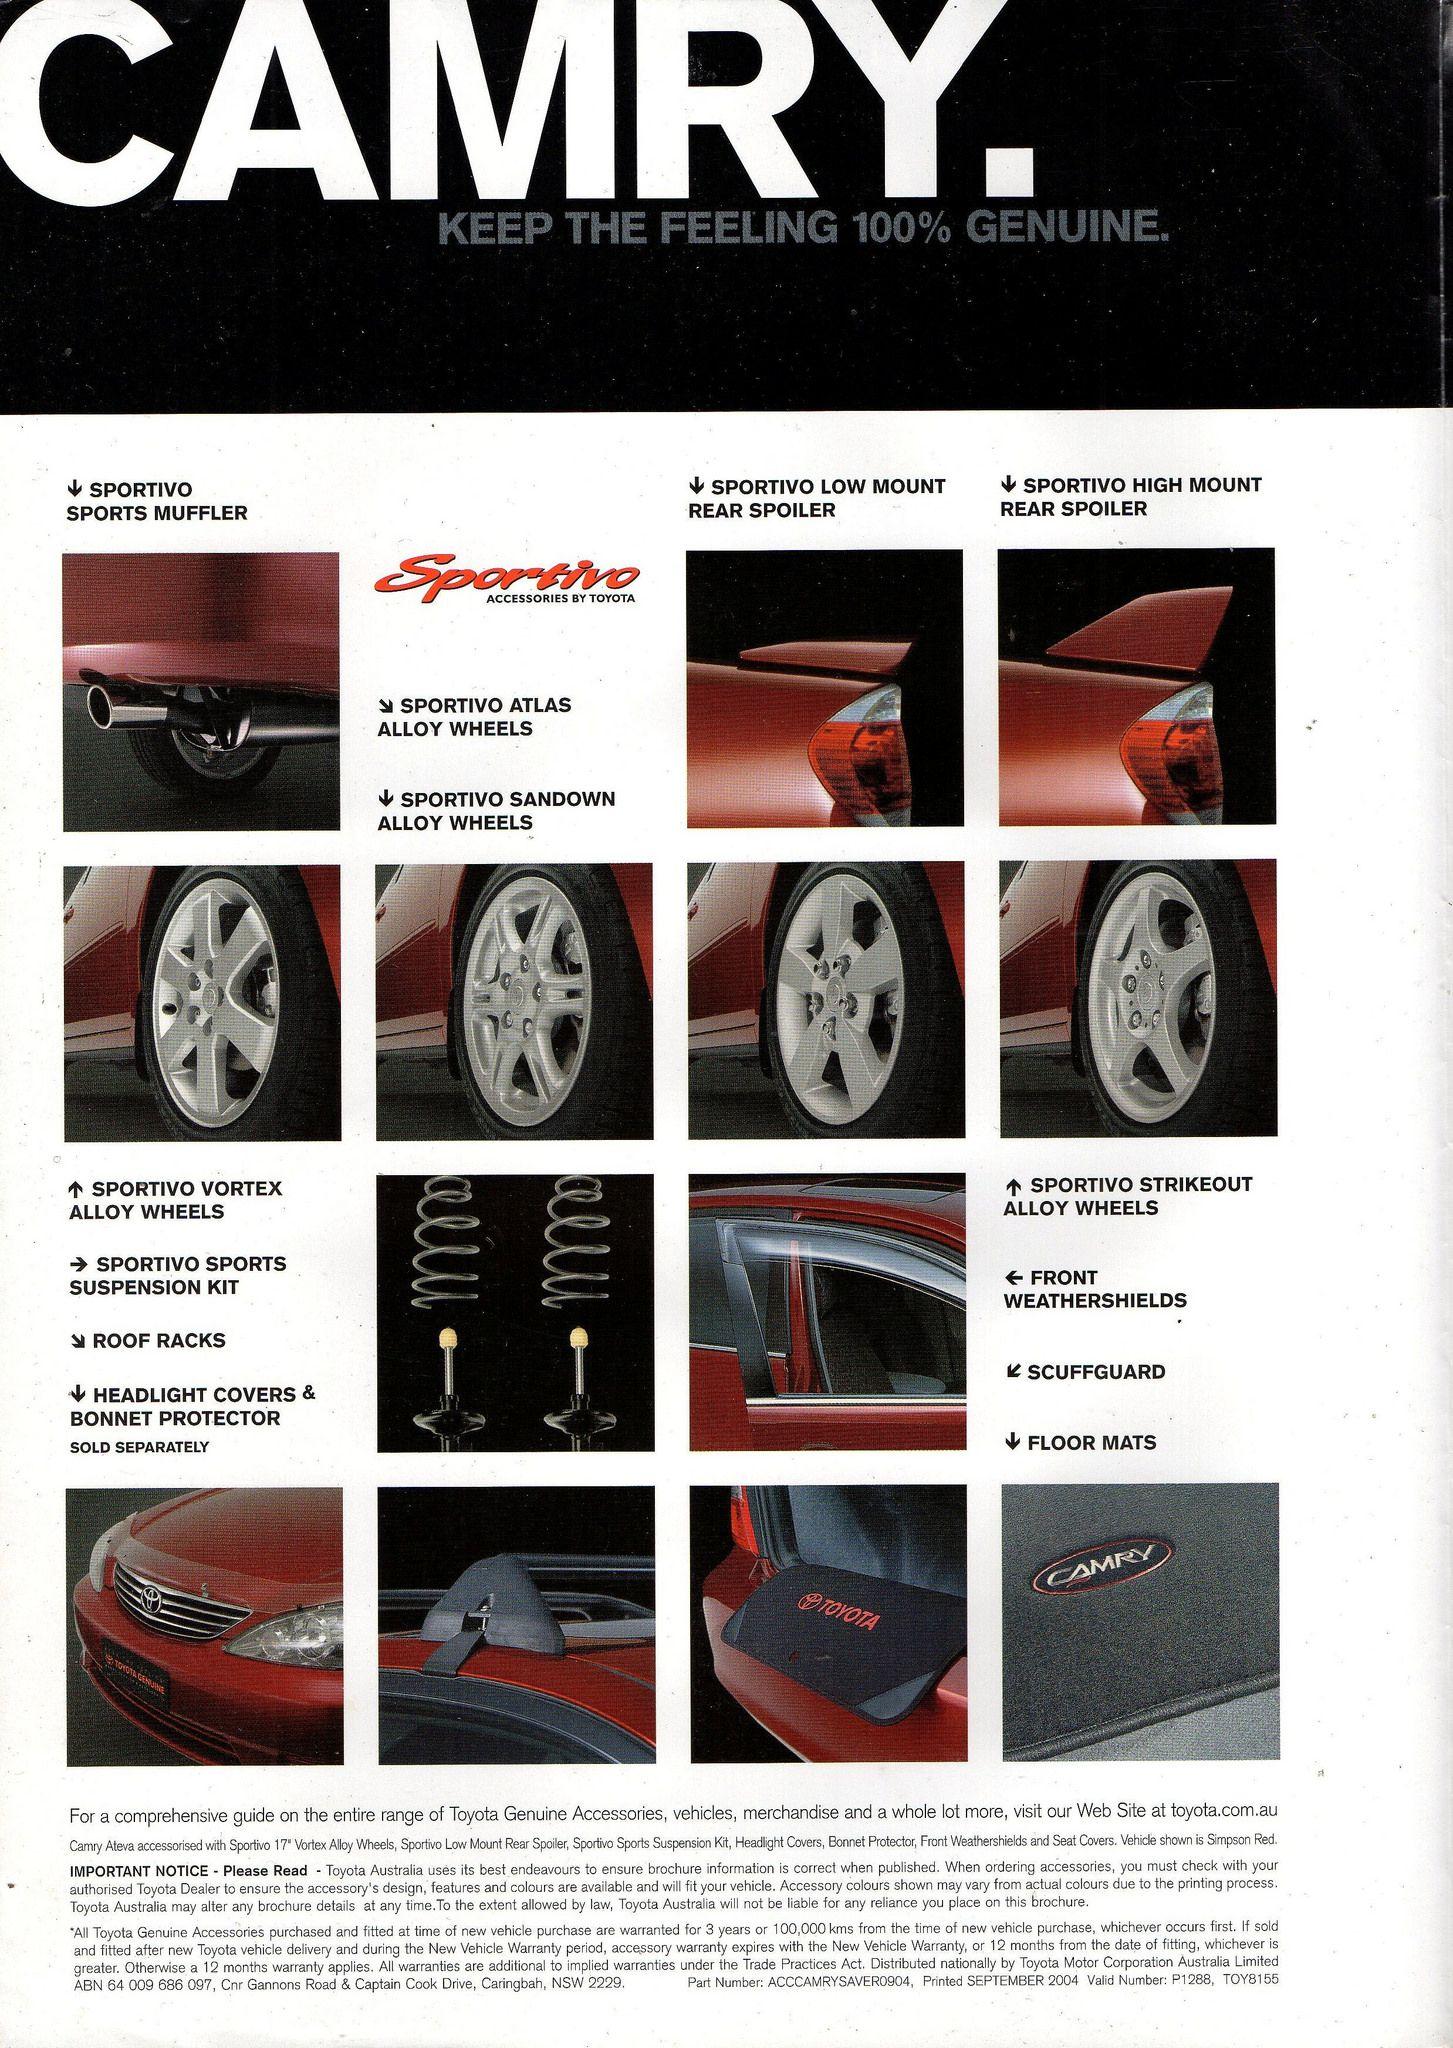 2004 Toyota Camry Genuine Accessories Australian Brochure Page 2 Camry Toyota Camry Toyota